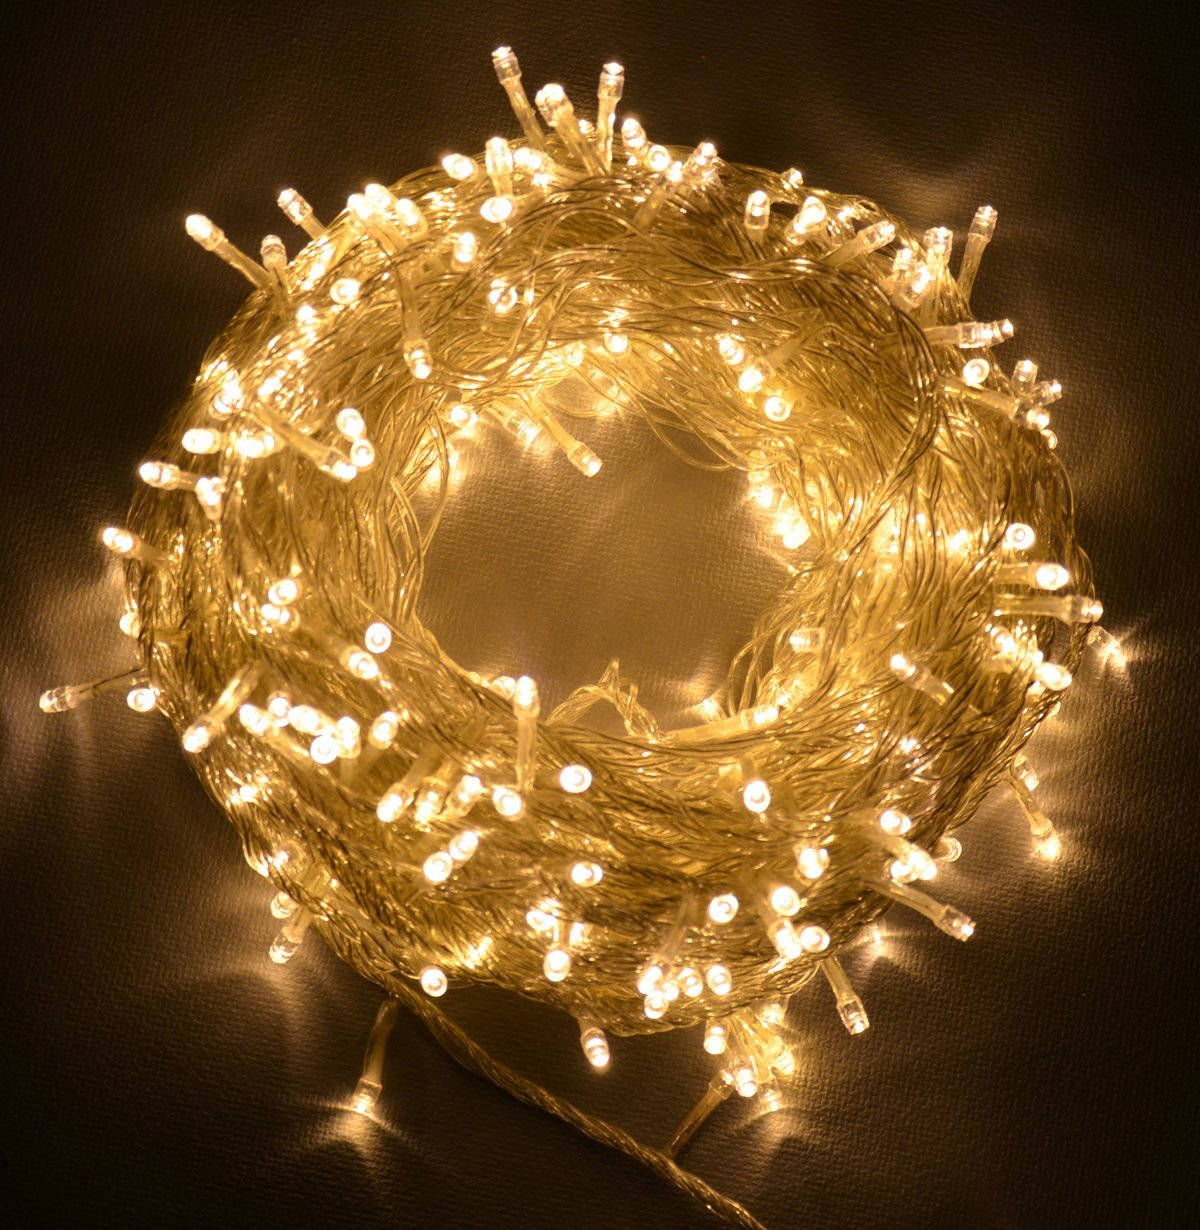 Christmas Icicle Lights Clearance